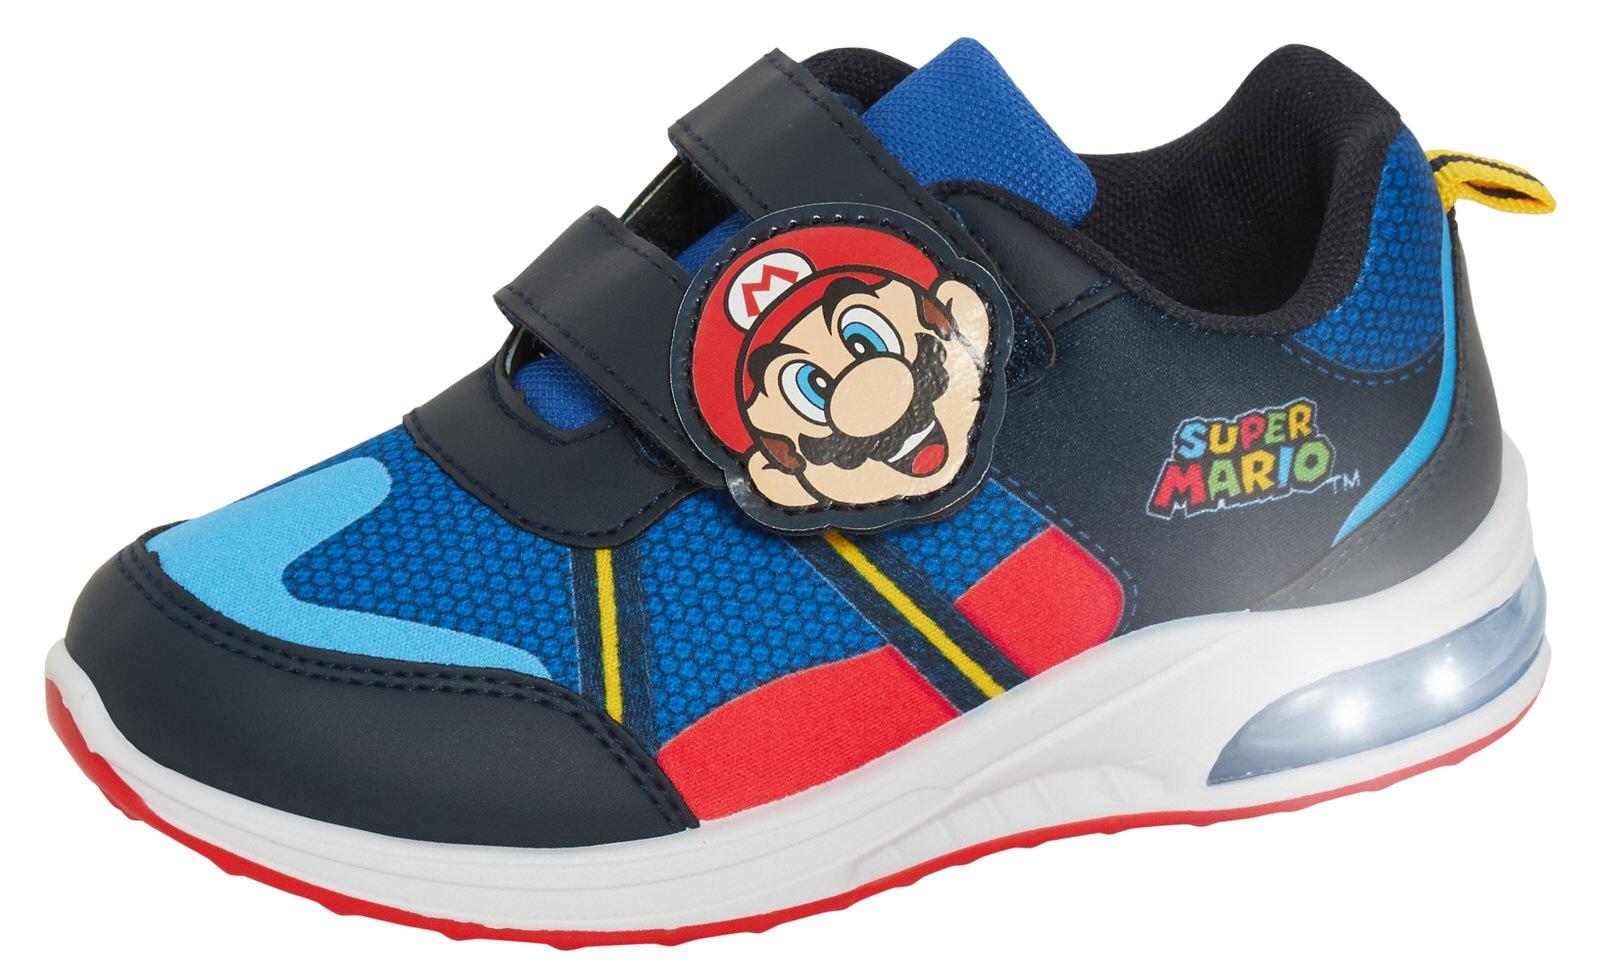 miniatuur 10 - Boys Super Mario Brothers Light Up Trainers Kids Nintendo Flashing Lights Shoes